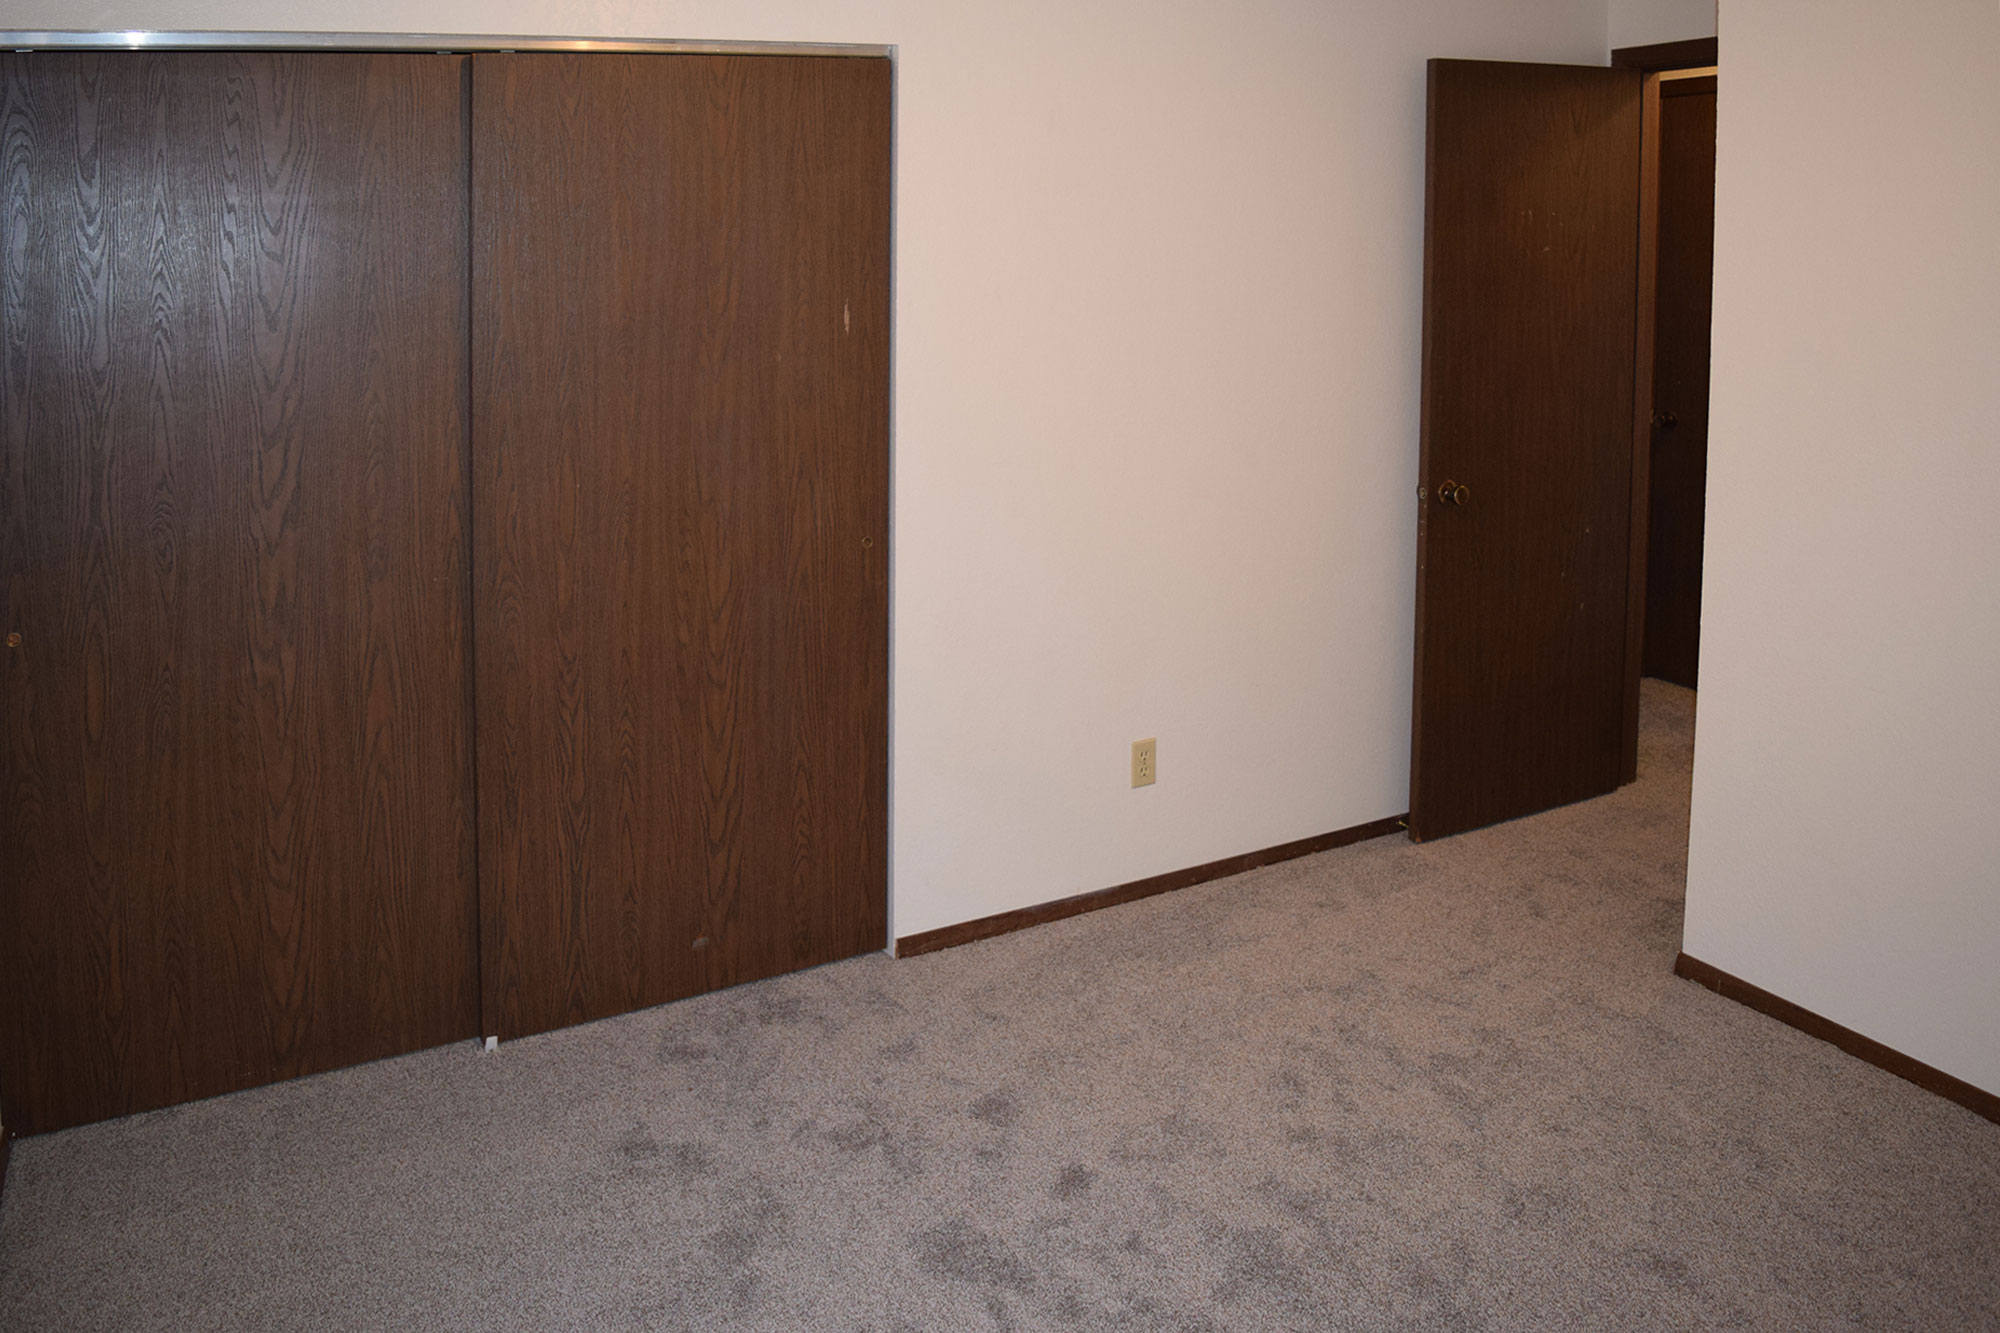 Bedroom2_1.JPG